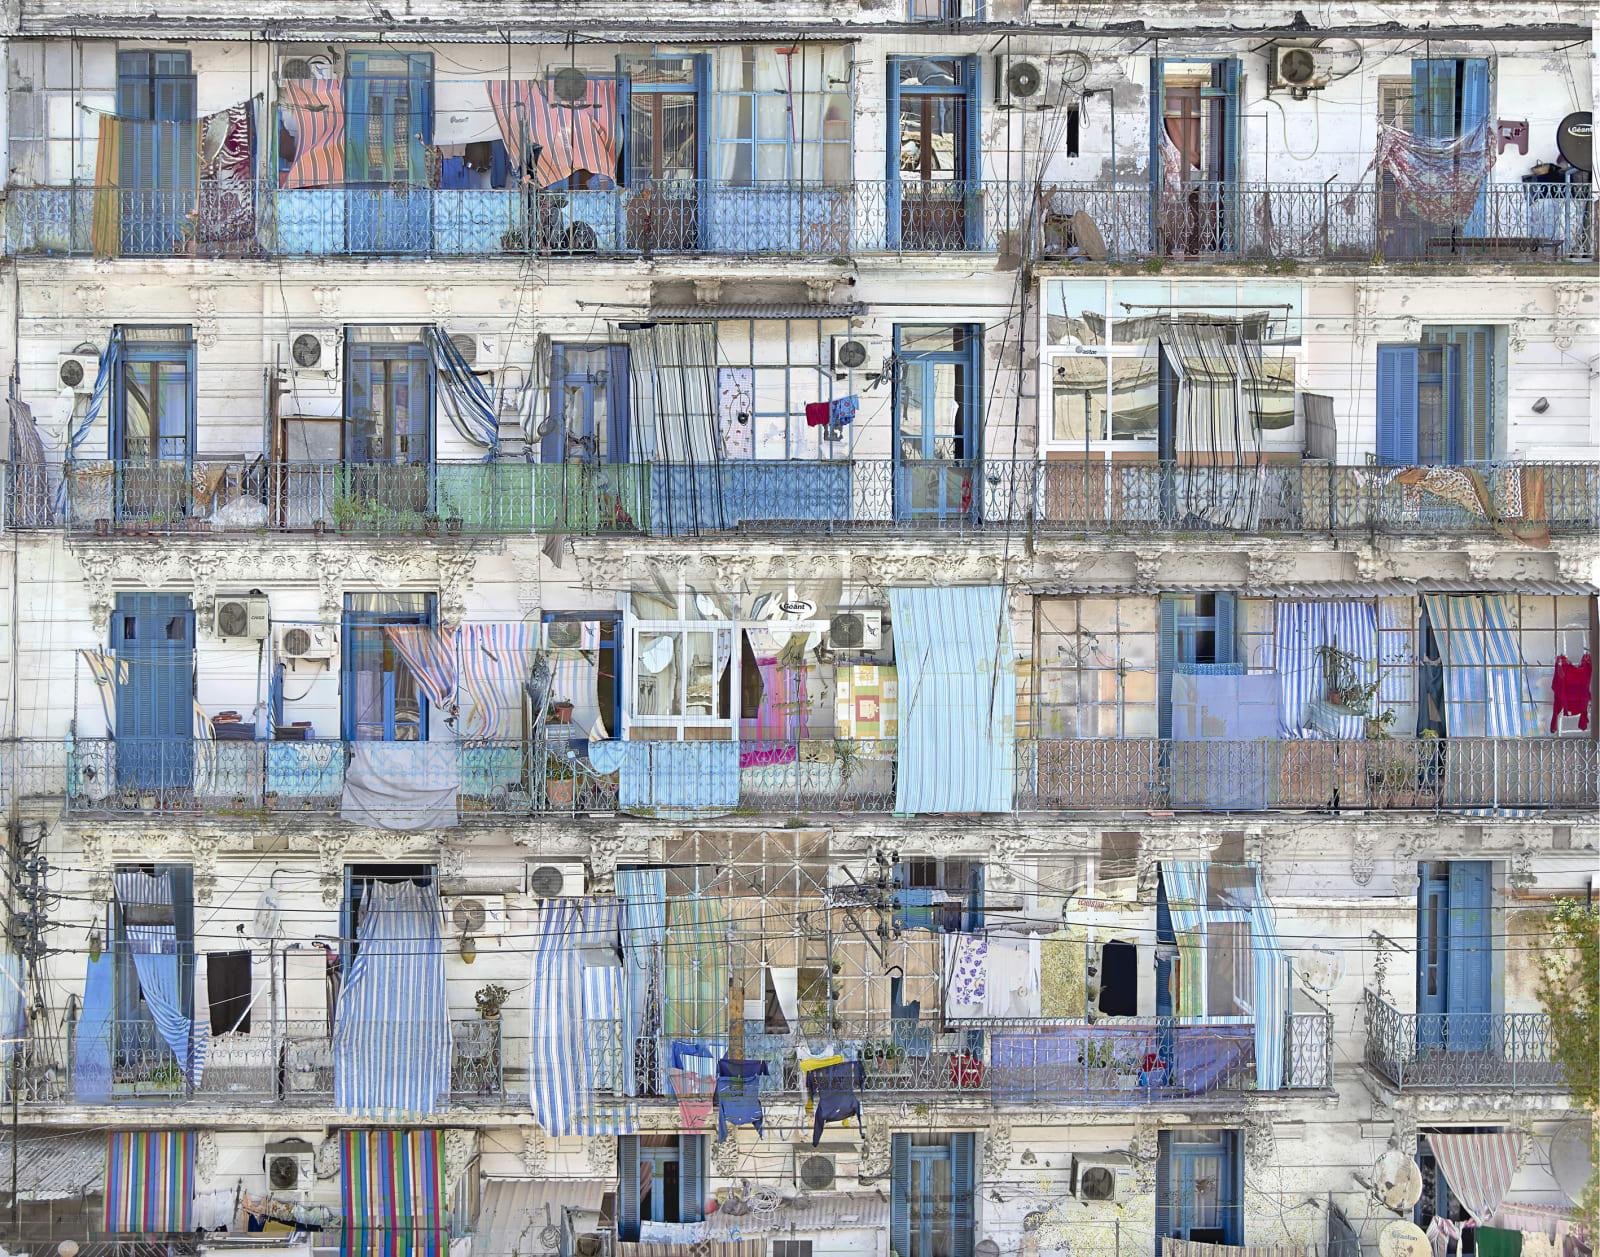 Stéphane Couturier, ALGER - Série 'Melting Point' Babel Oued # 10, 2015-2017